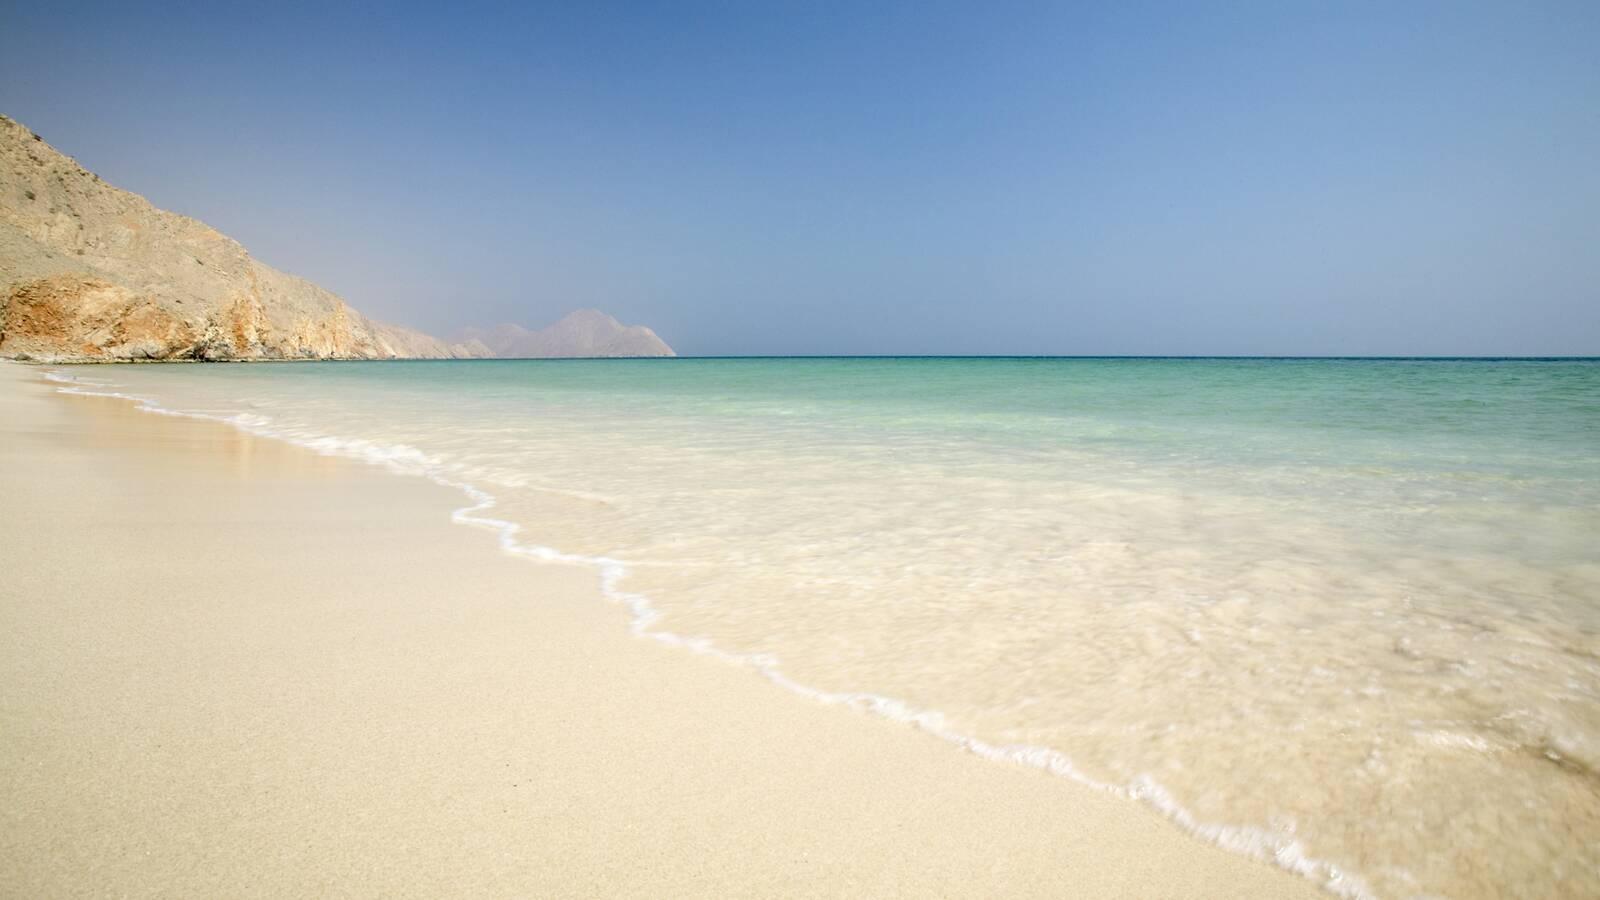 Six Senses Zighy Bay Plage Oman